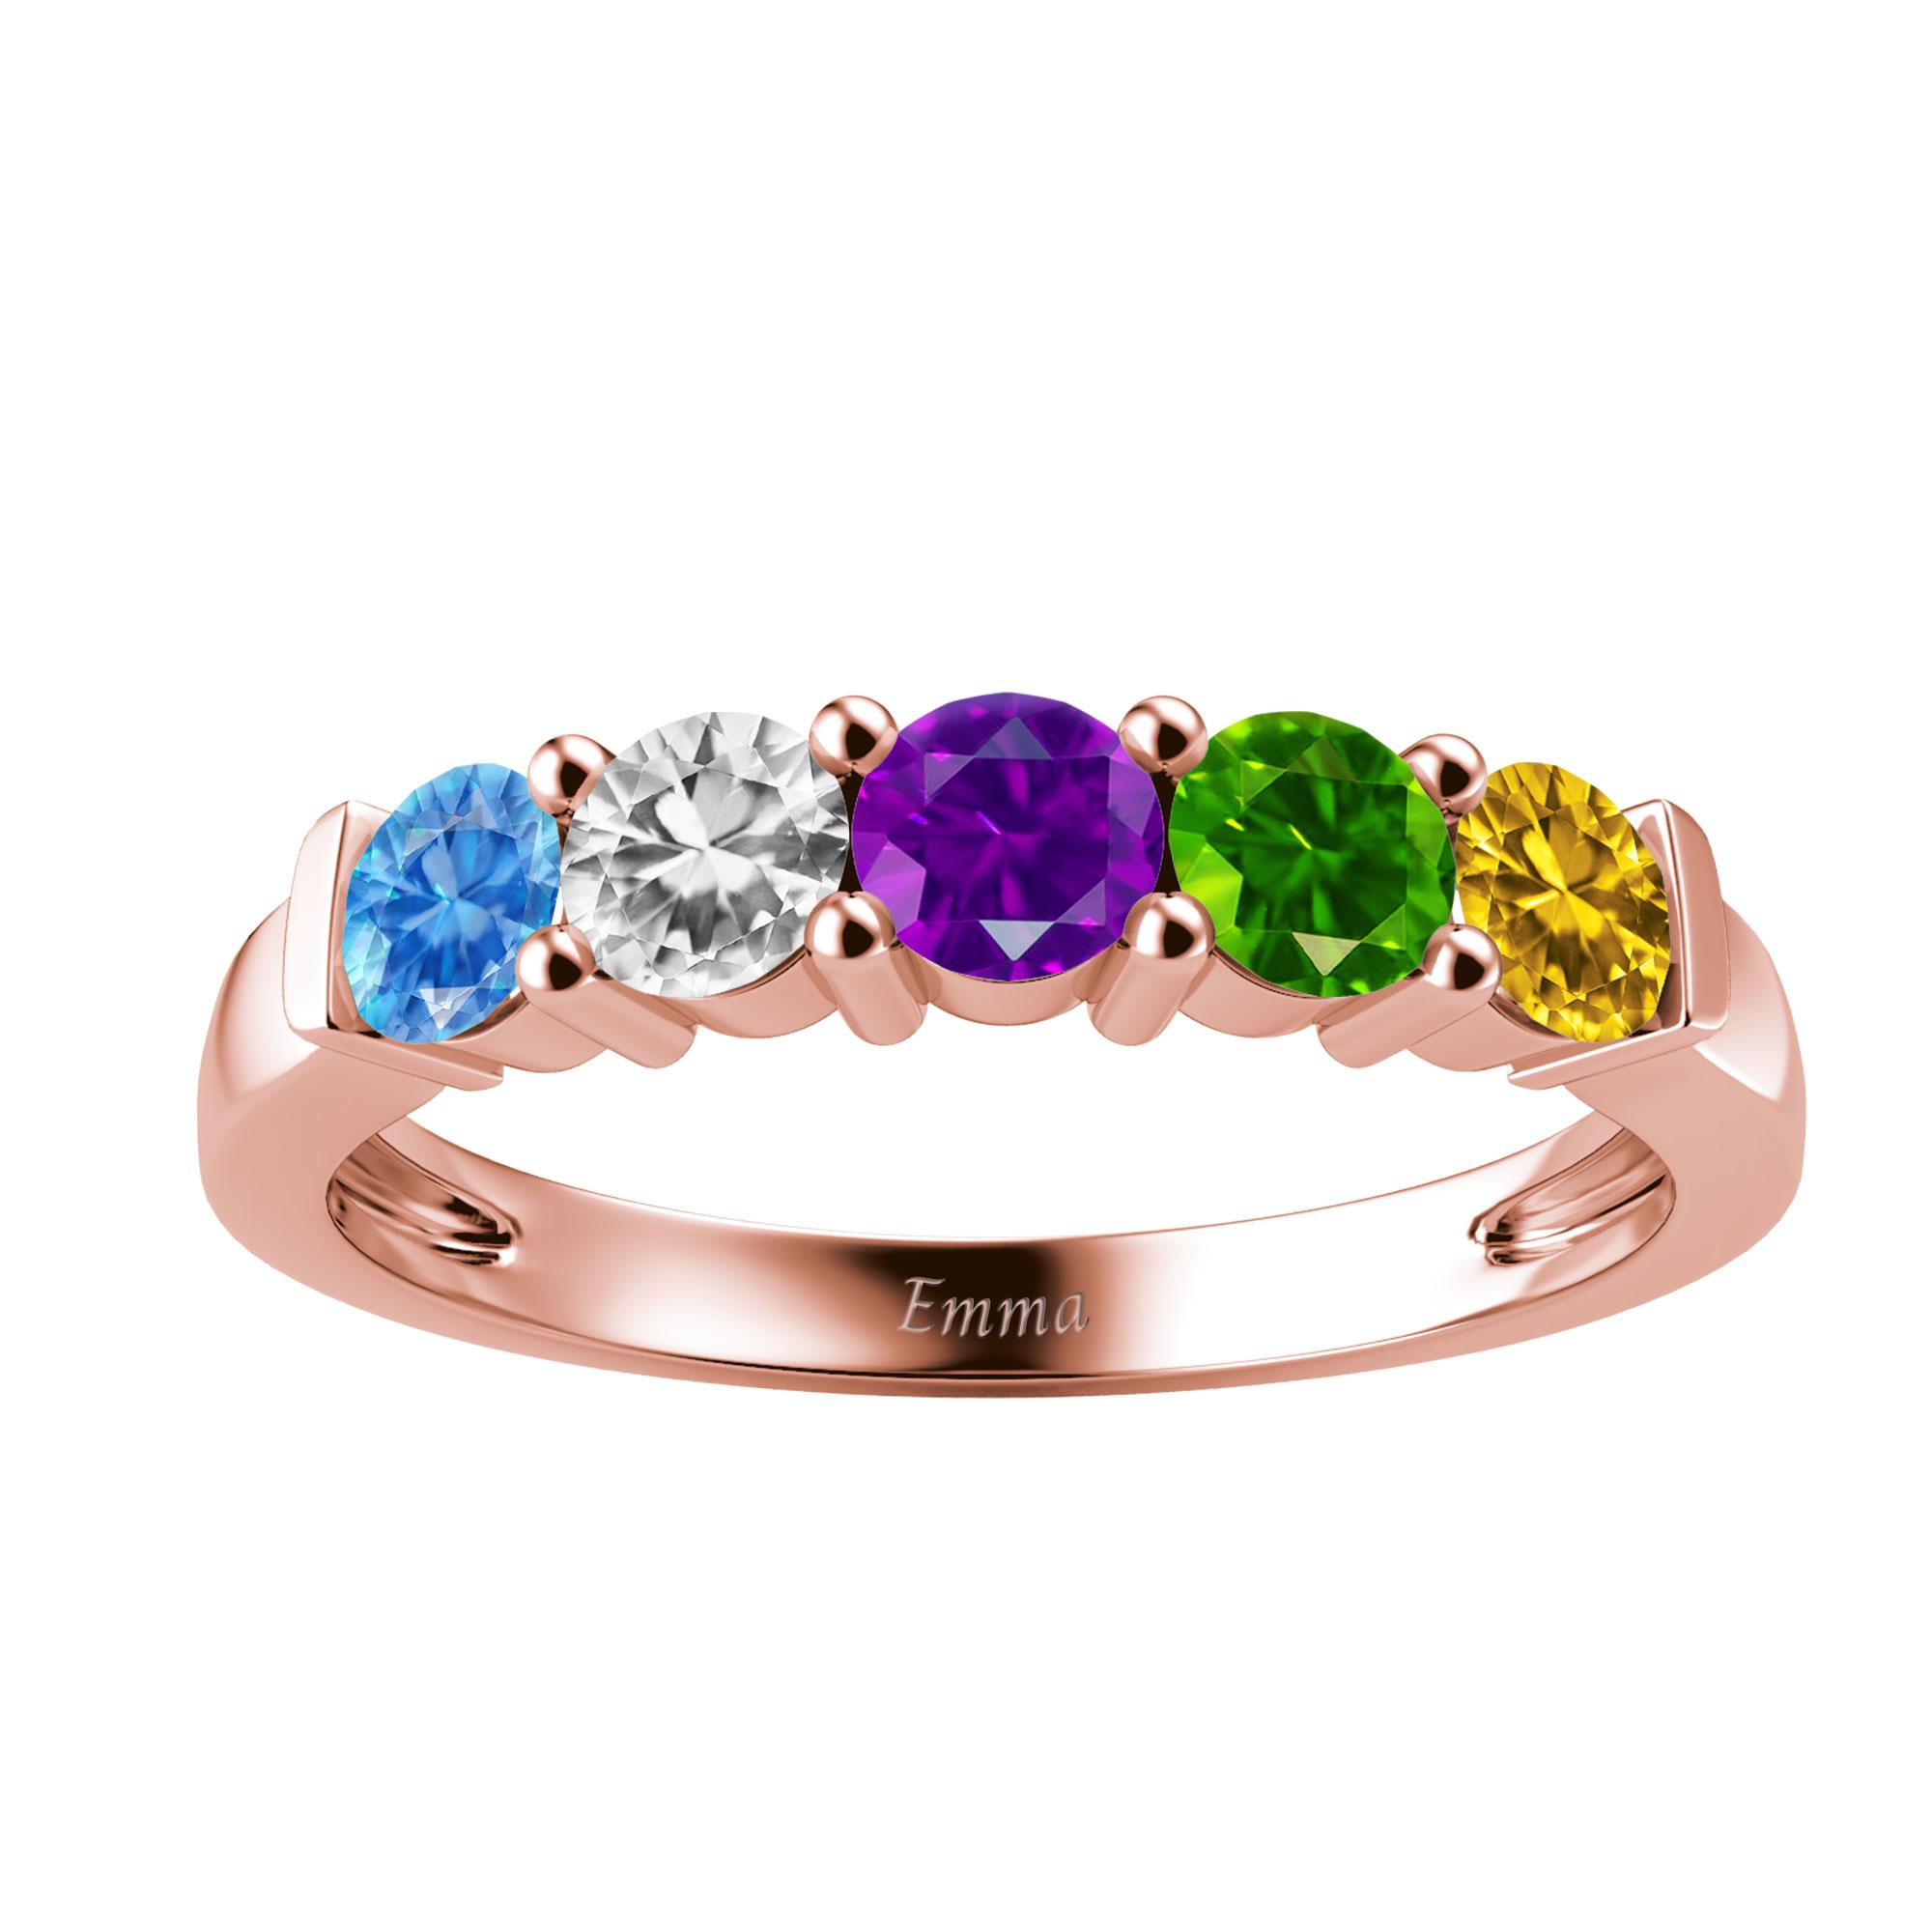 Mother's Custom Birthstone Single Row Engravable Family Ring (2-5 Gemstones)